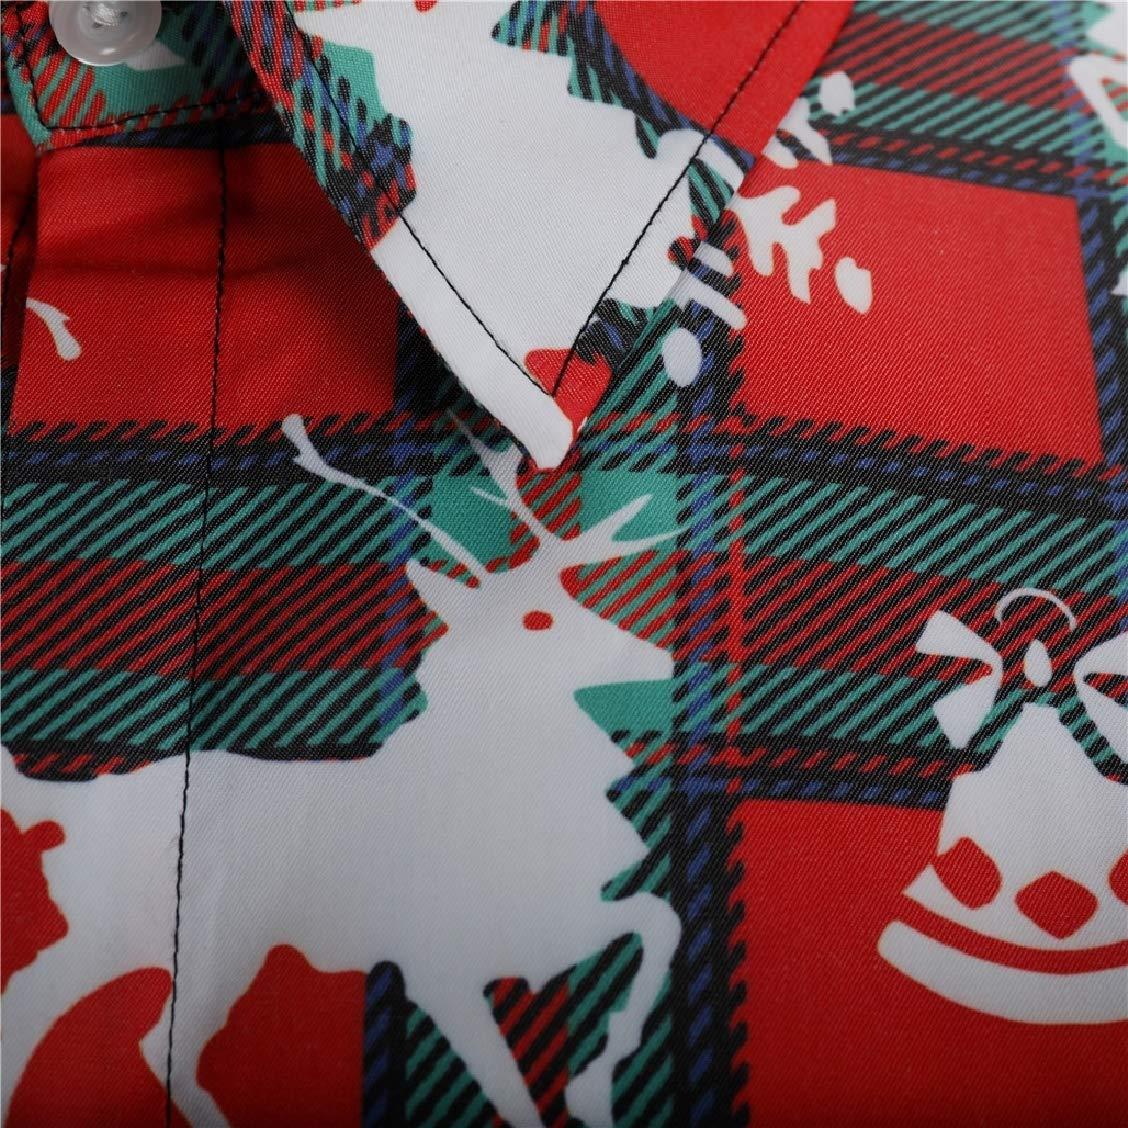 FieerMen Oversize Christmas Theme Deer Christmas Tees Work Shirt